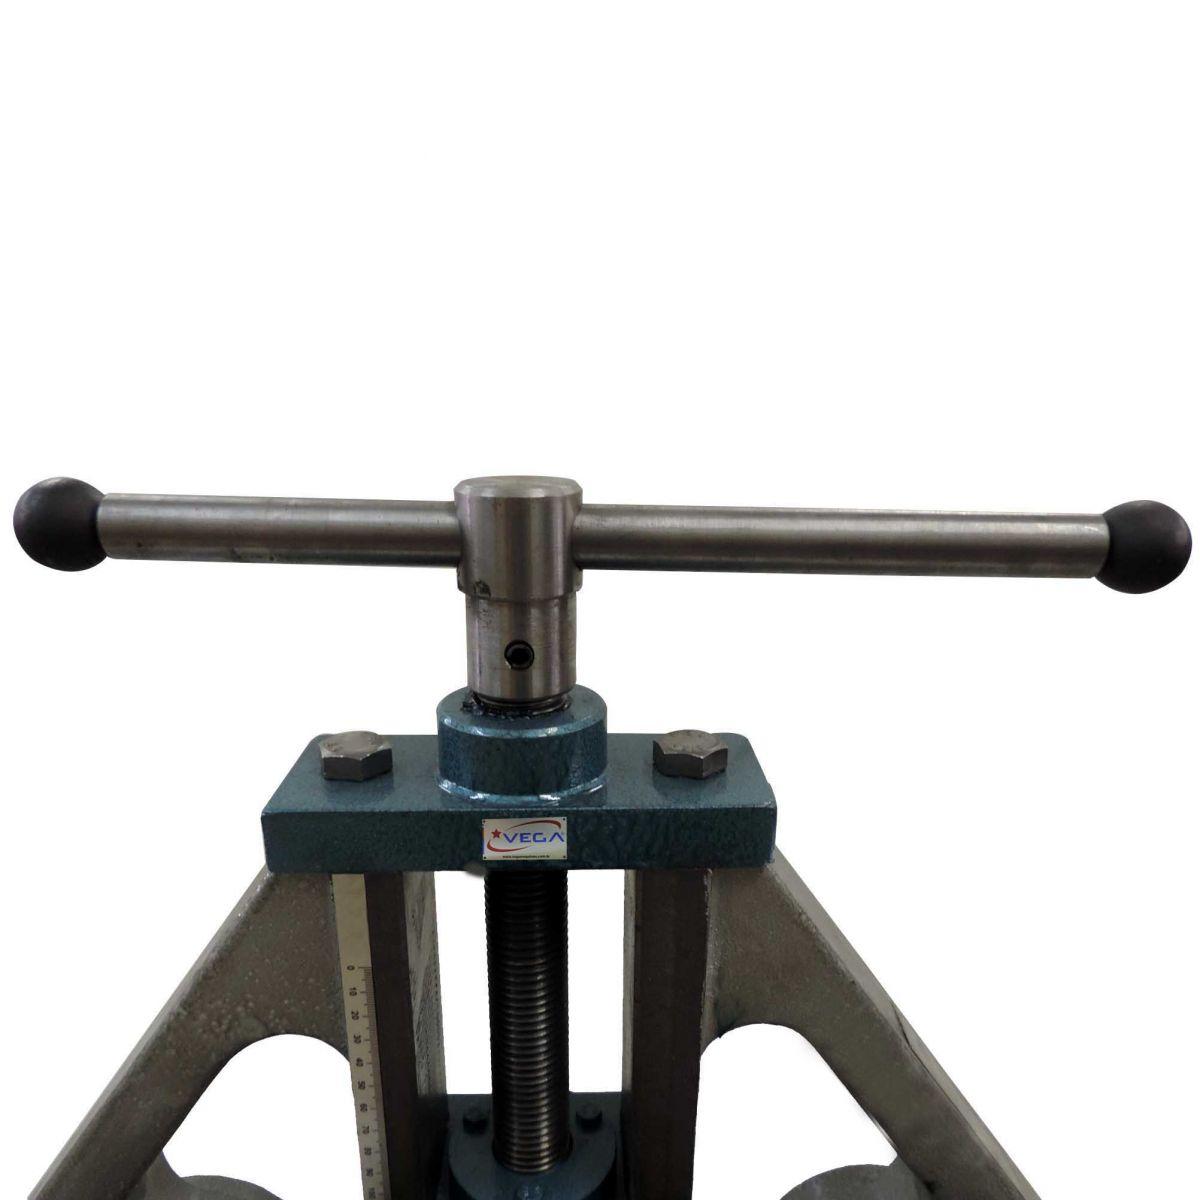 Calandra de Perfil VEGA-2 Manual - Novo